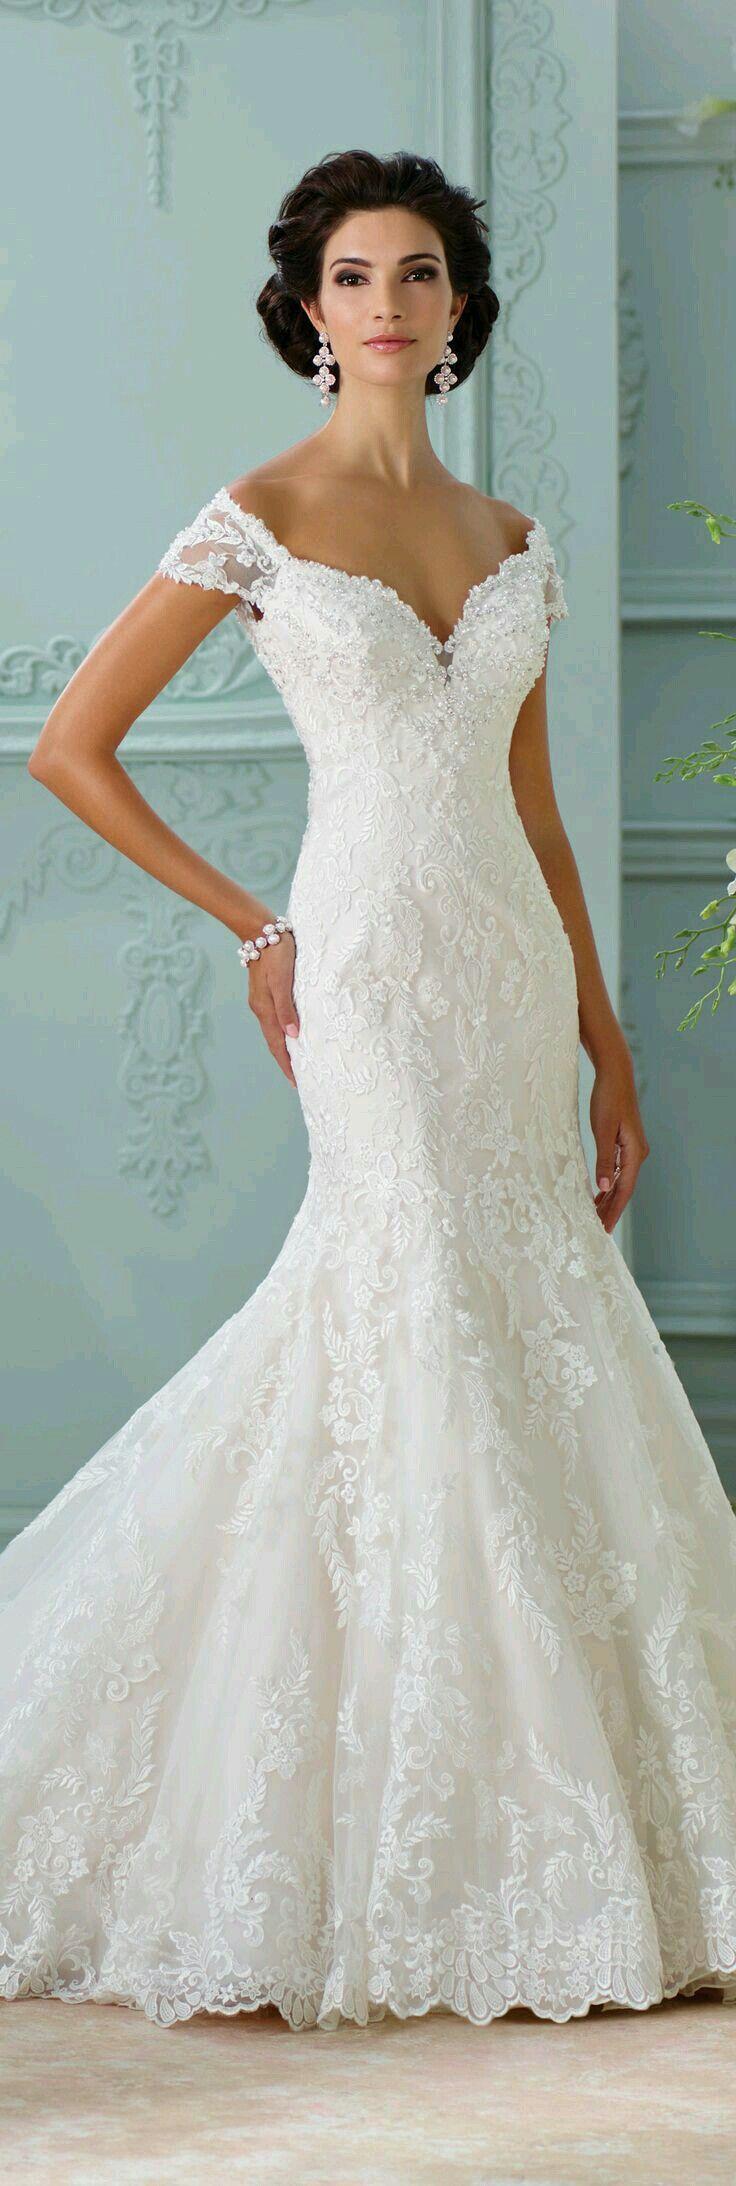 best wedding dresses images on pinterest weddings bridal